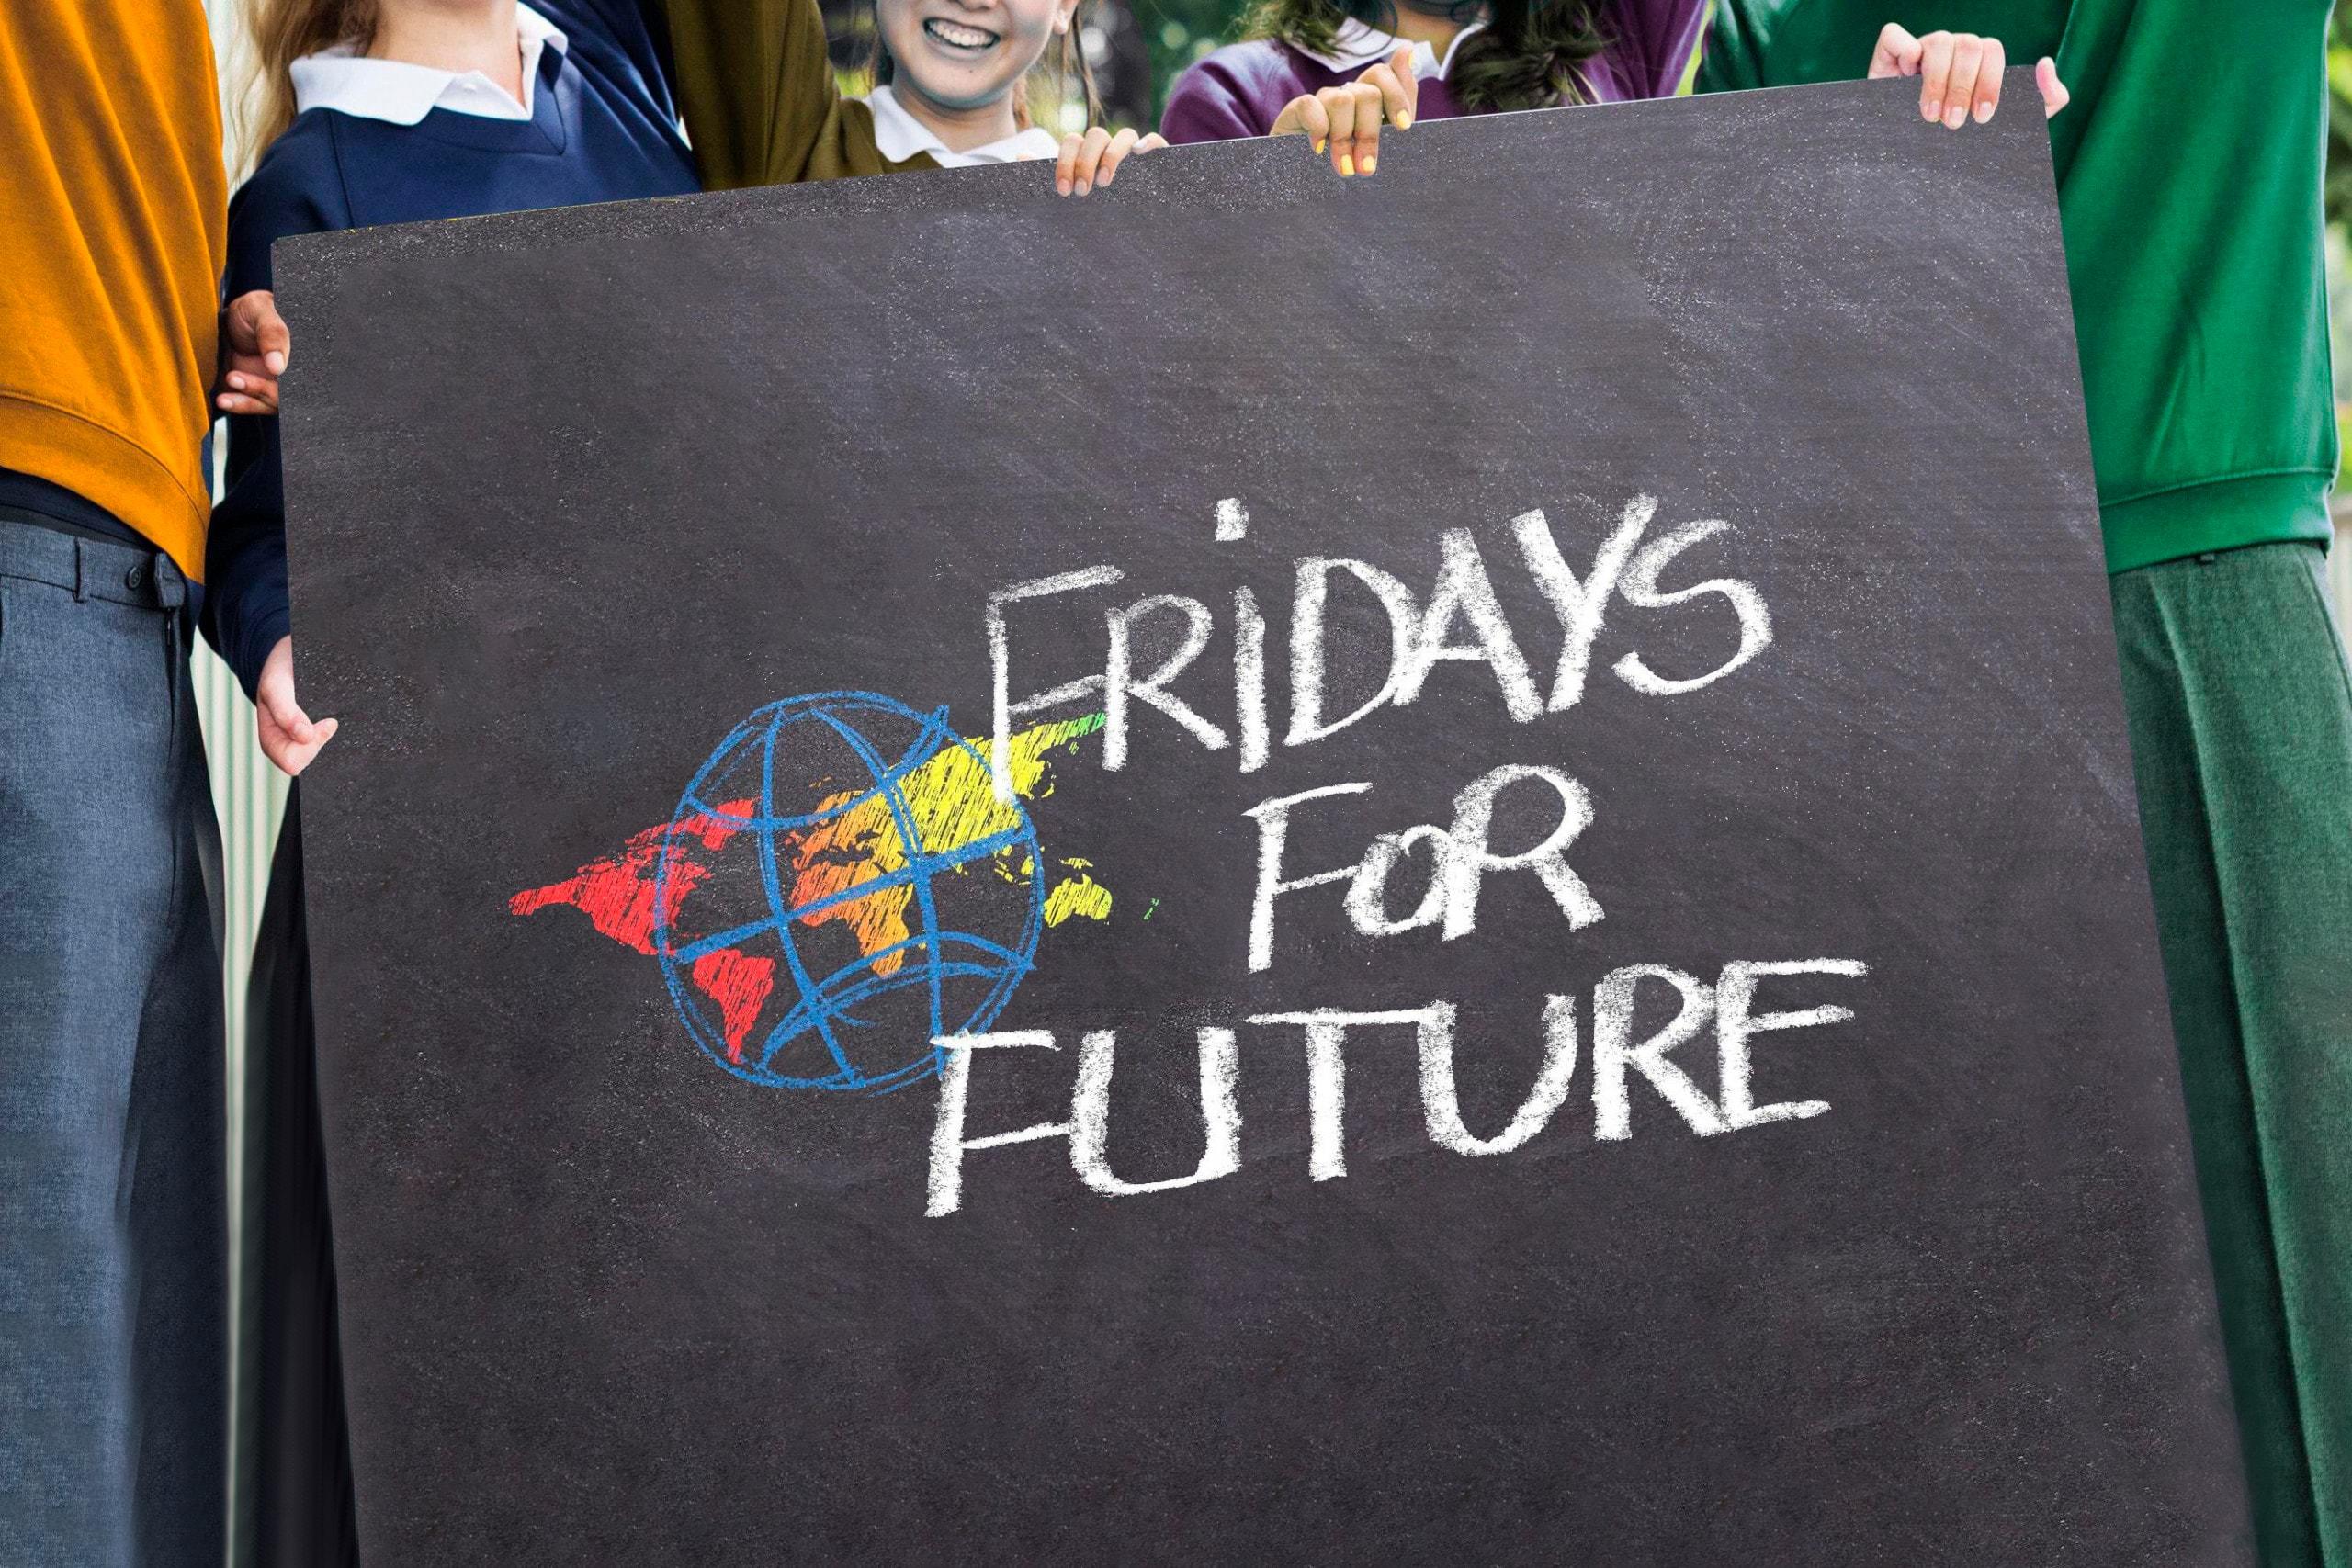 Fridays for Future plant Protest online Globaler Klimastreik am Freitag auch in Regensburg